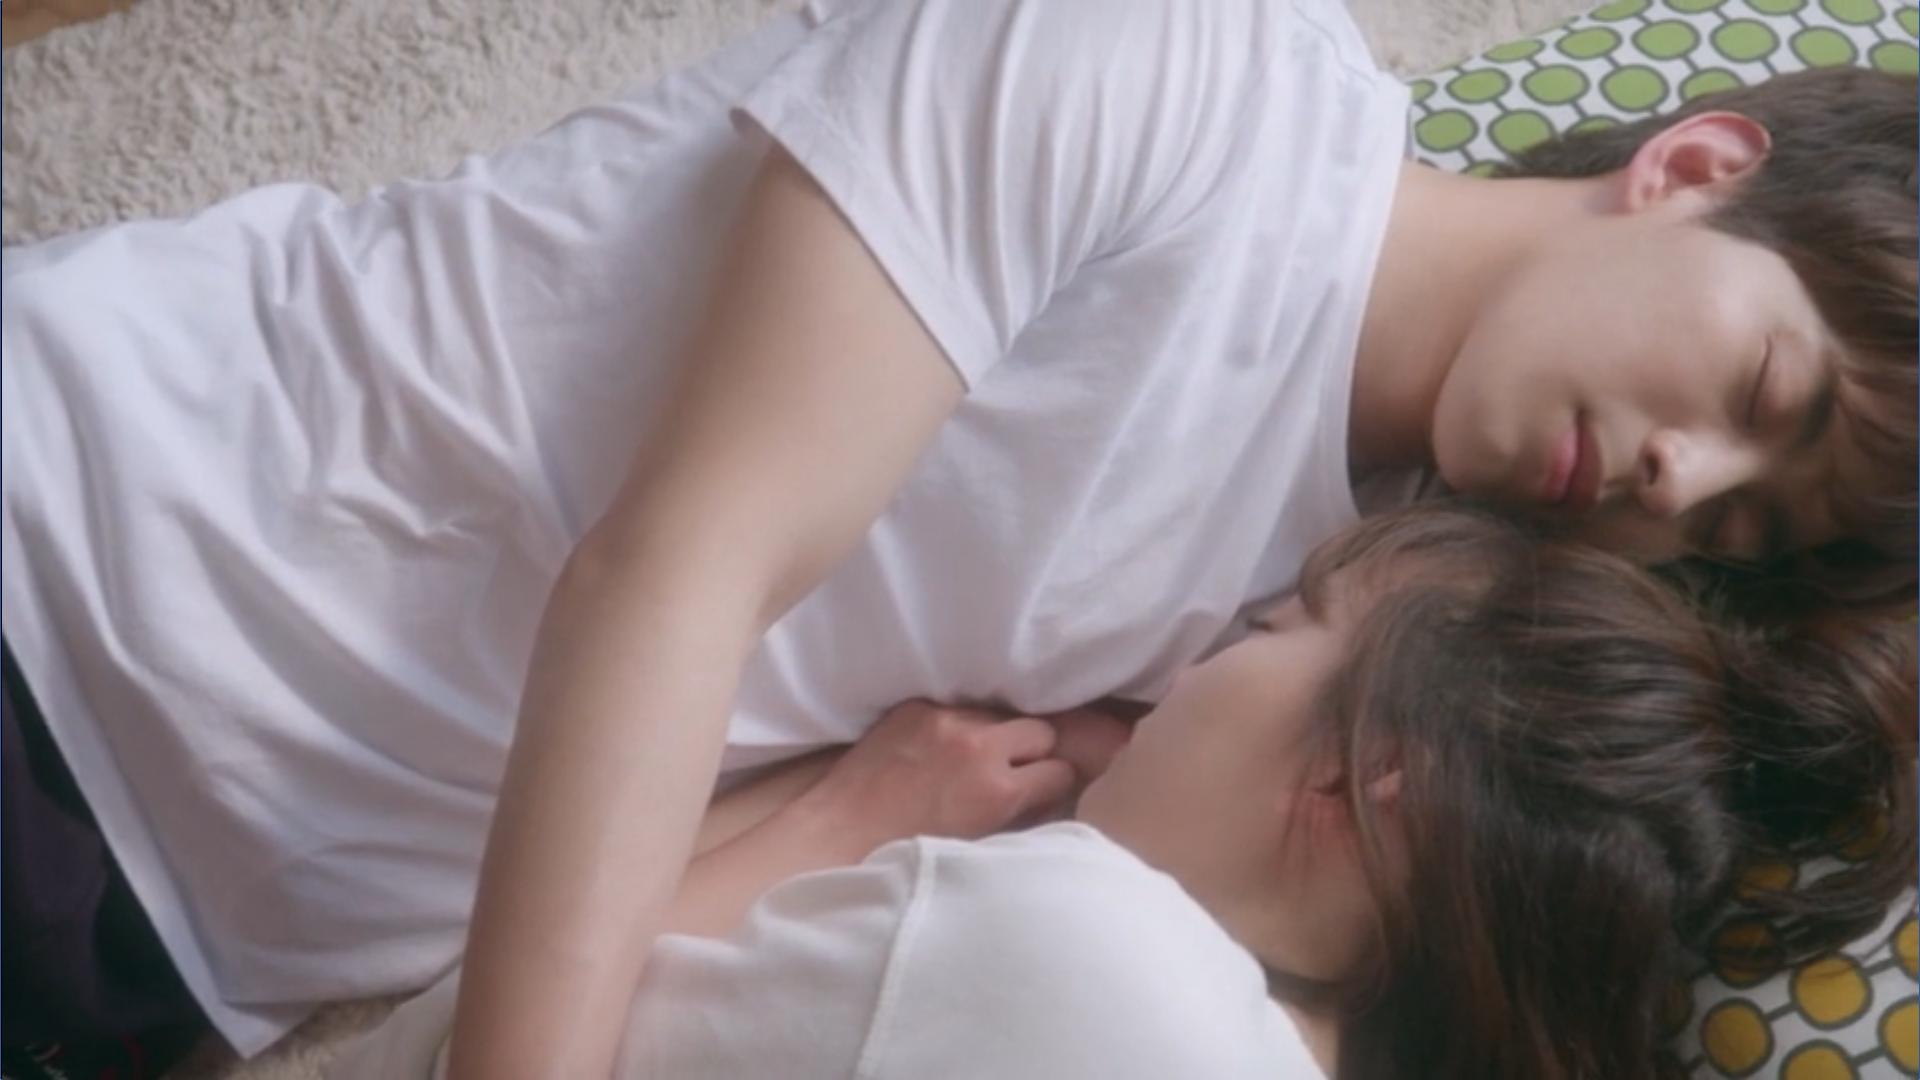 Wednesday 3:30 PM Seon Eun-woo and Yoon Jae-won hugging and sleeping